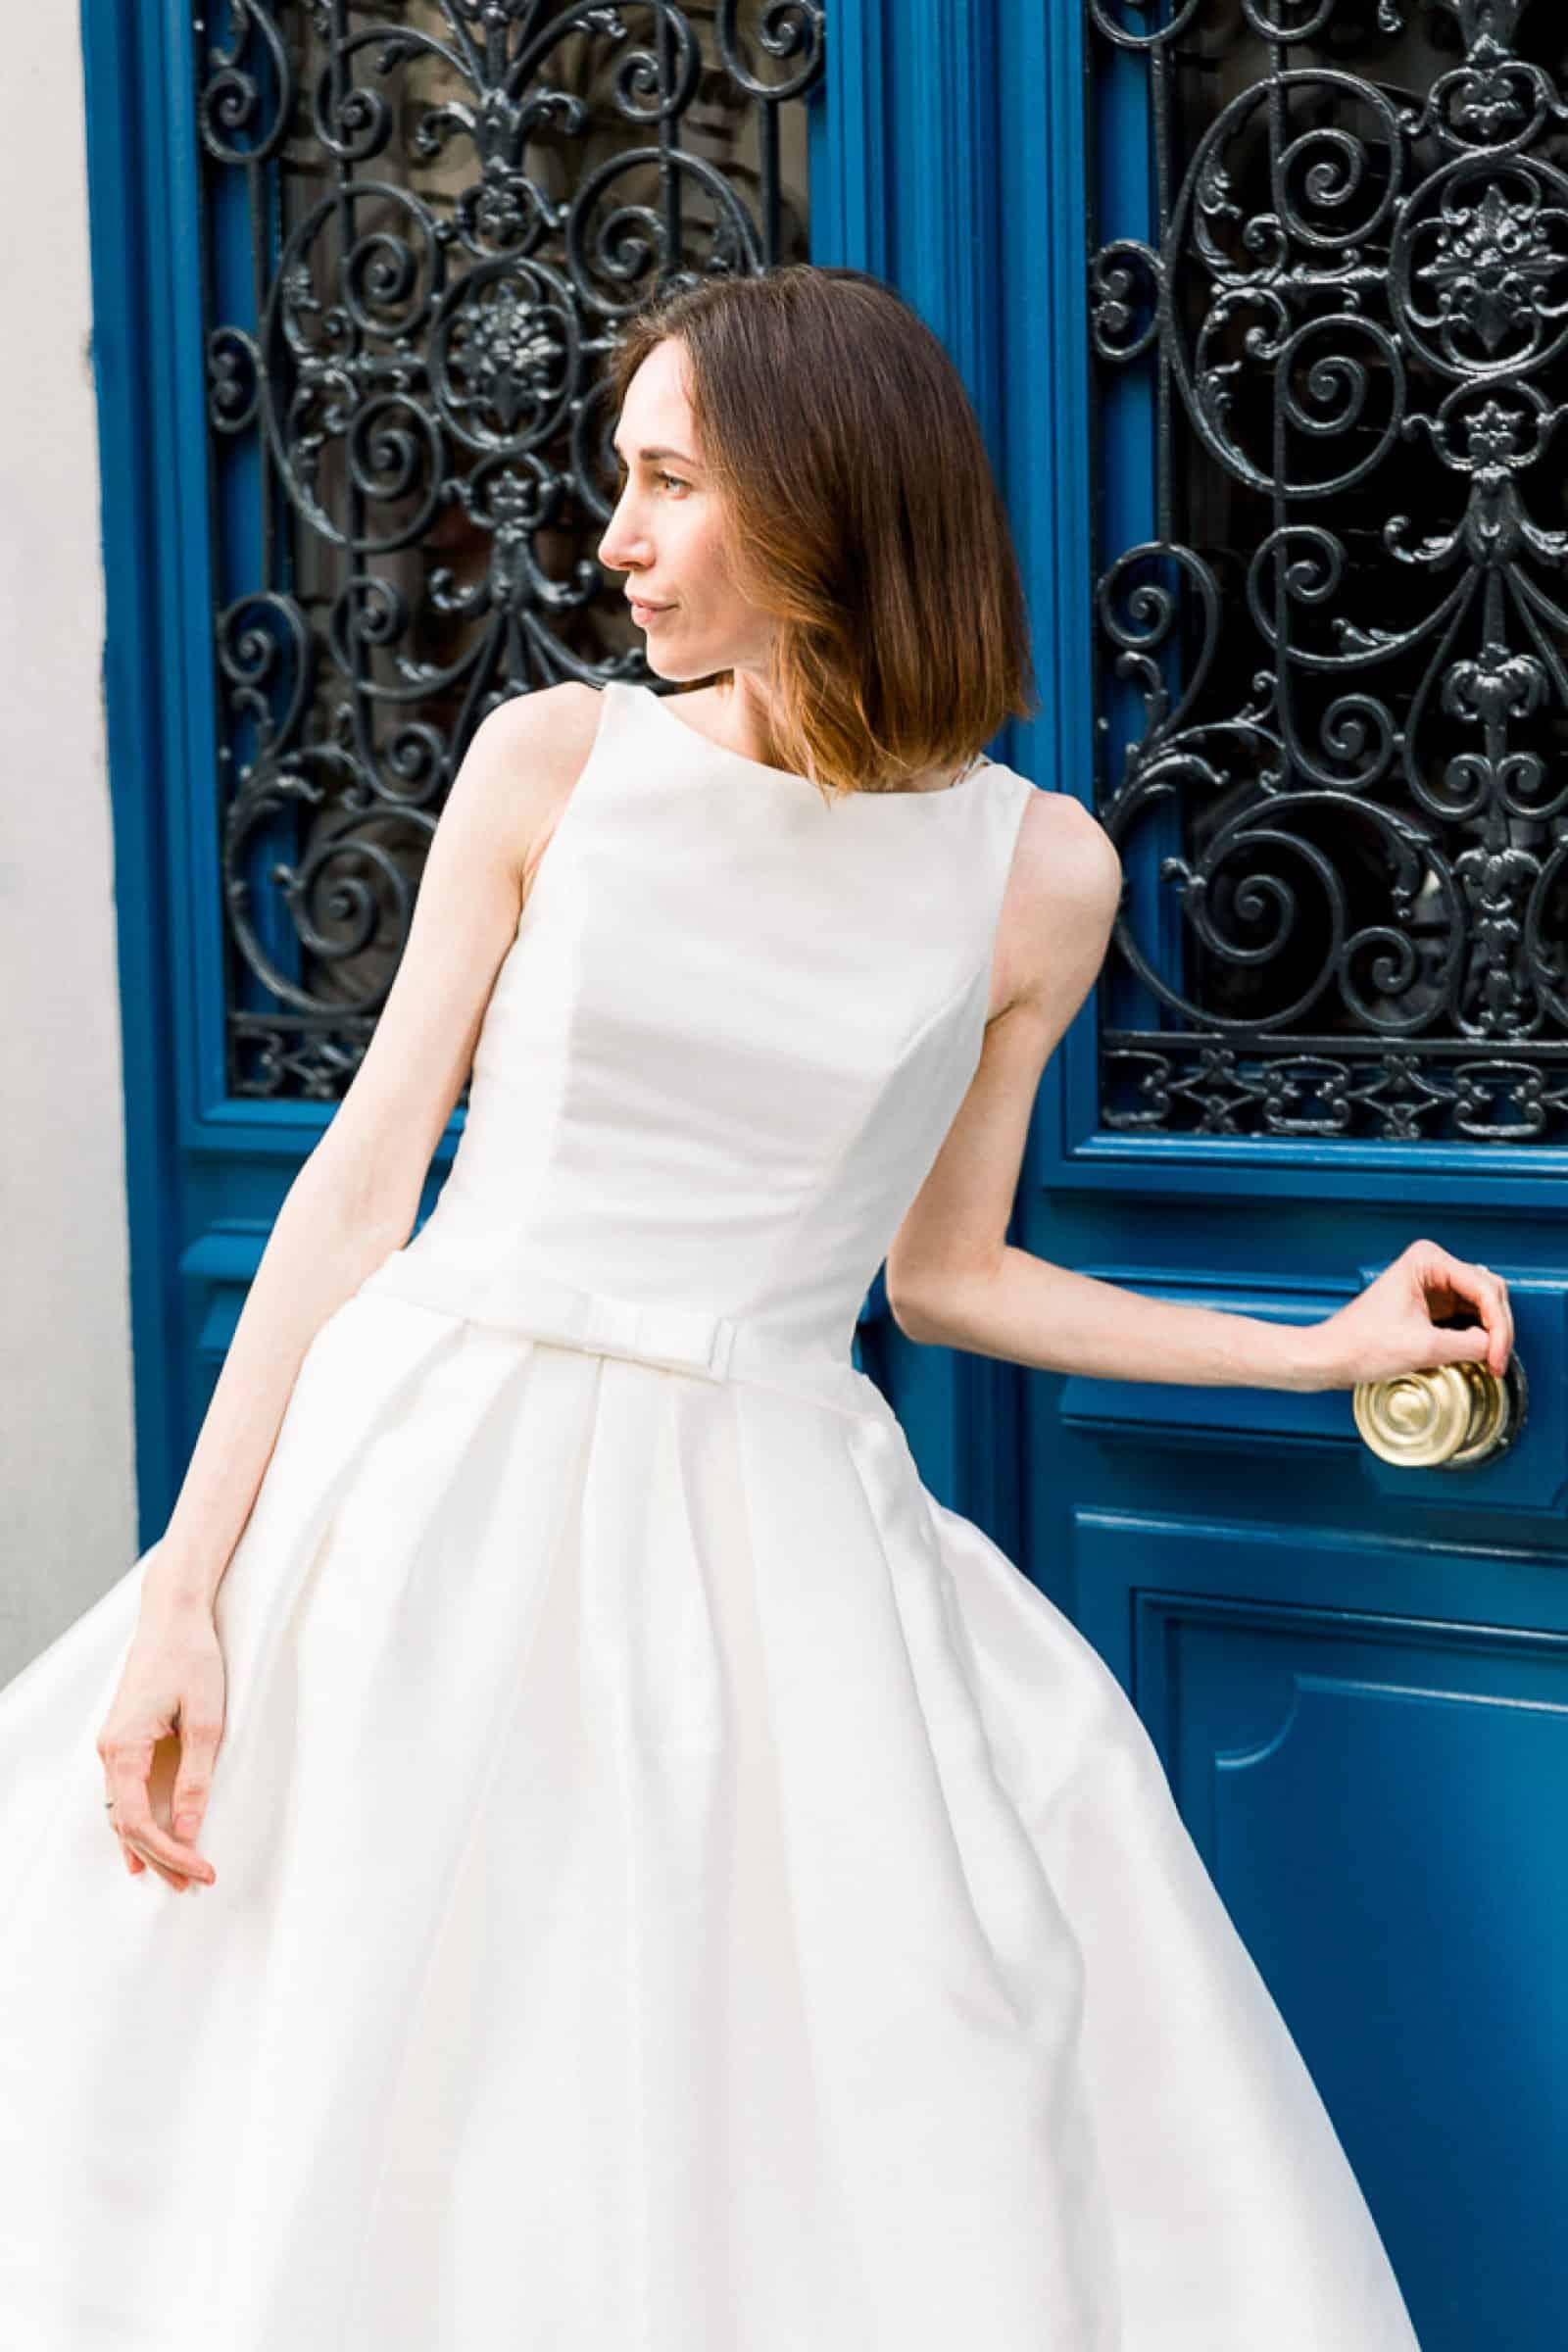 Modern bride in Paris, France with blue door